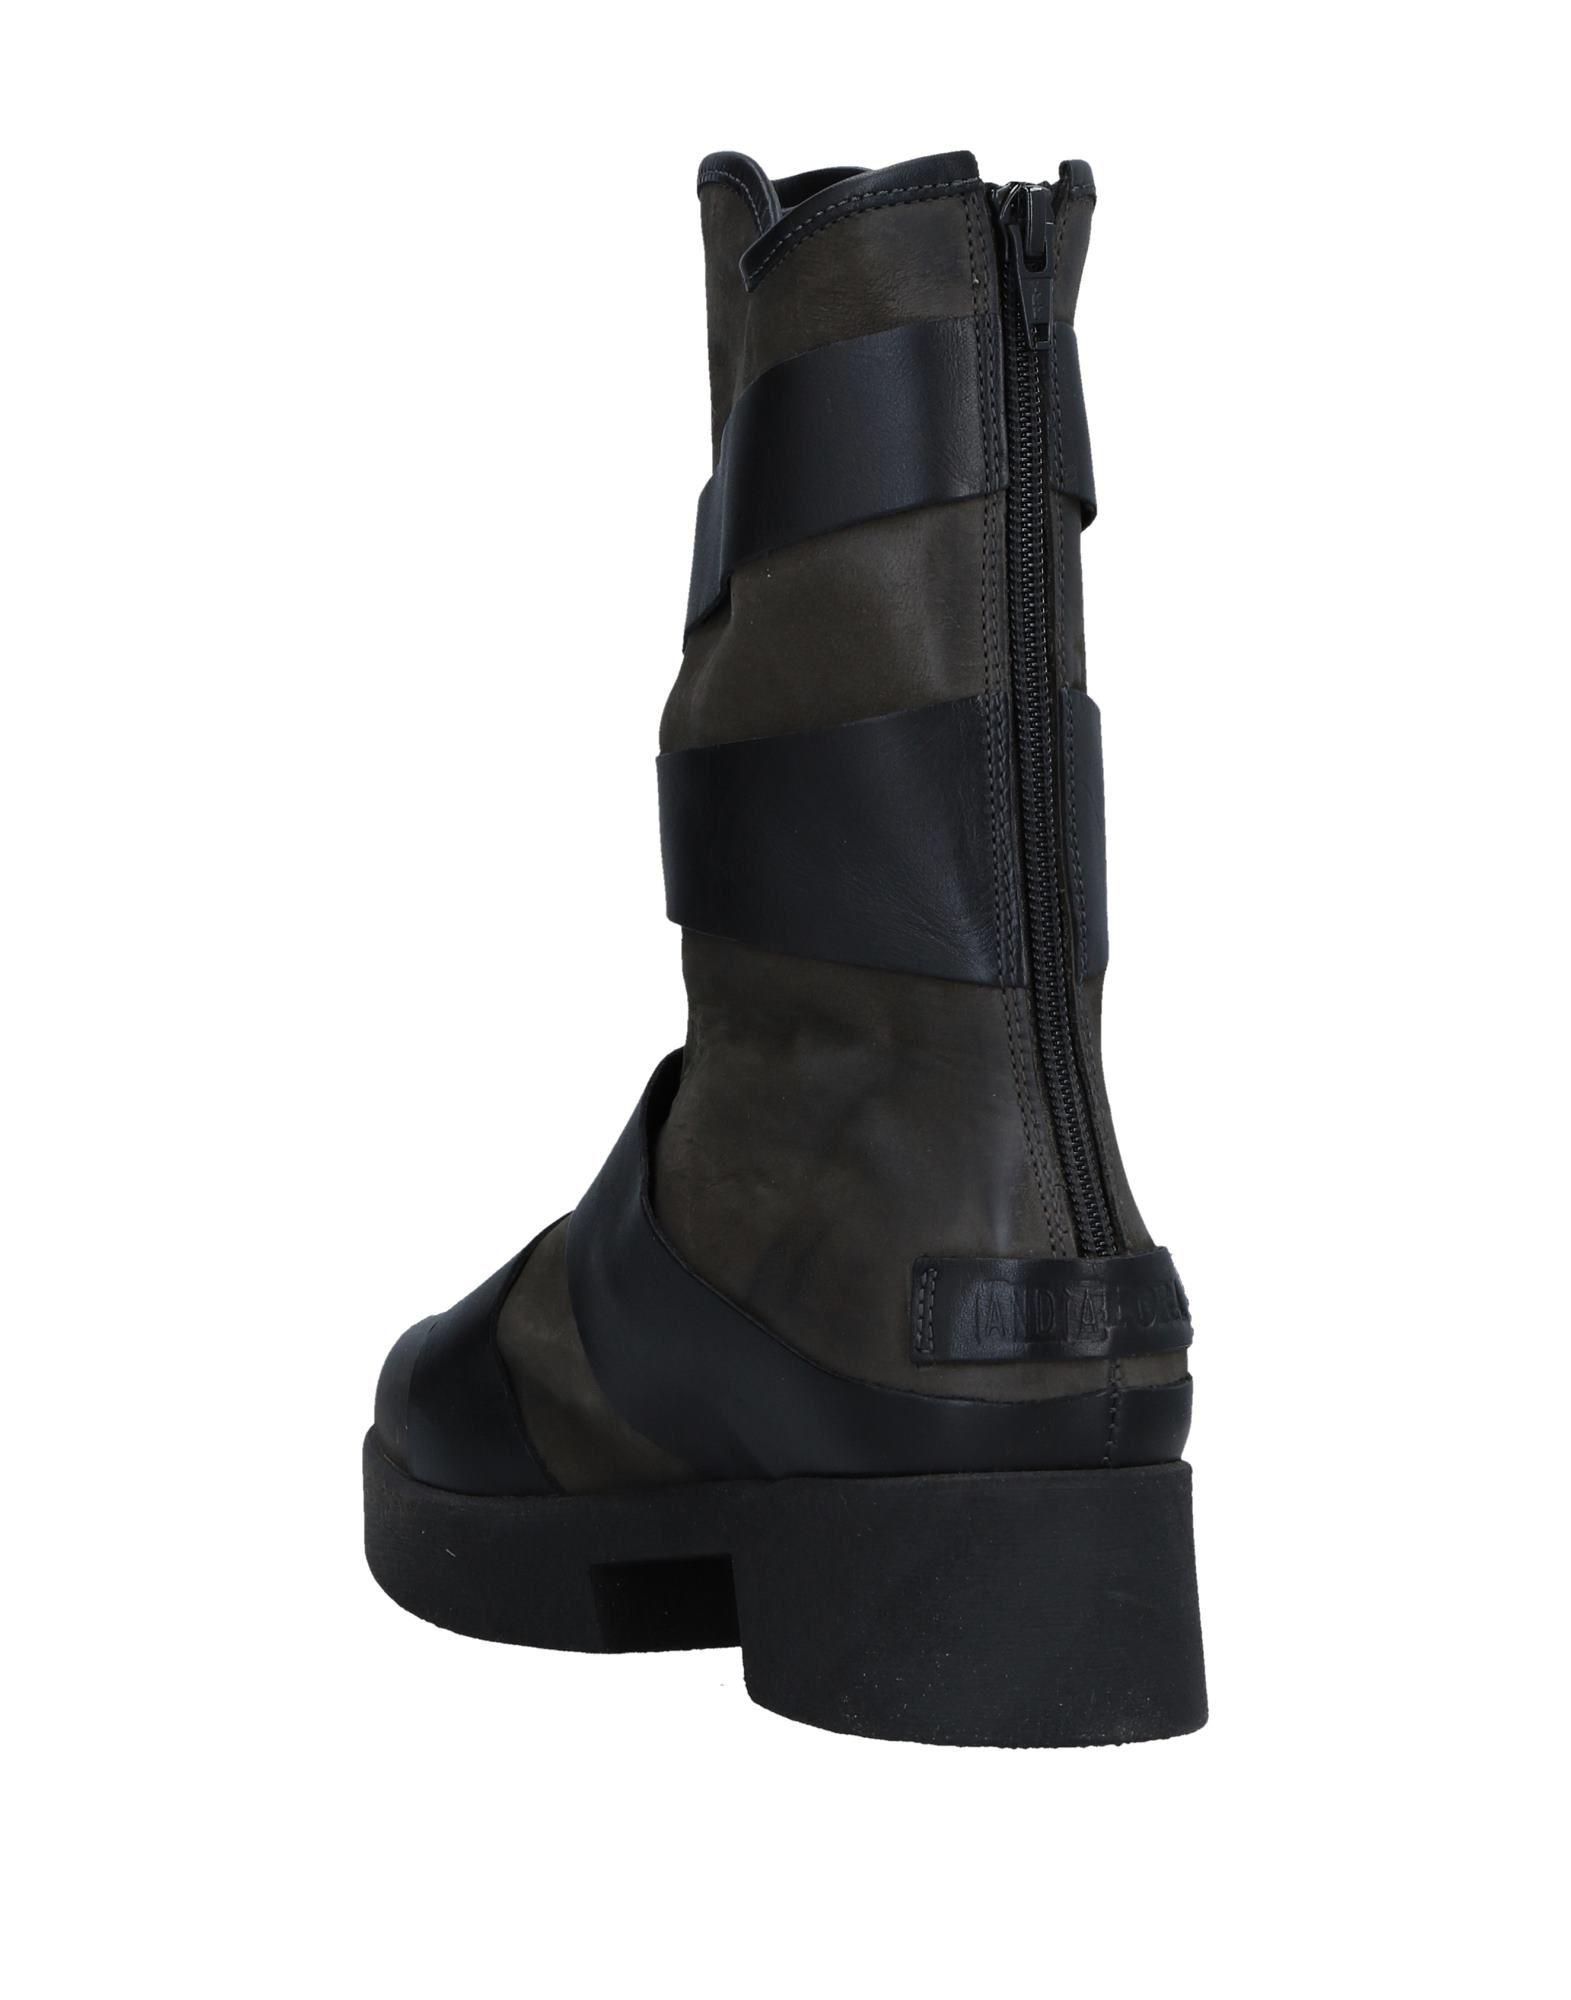 Stilvolle billige Schuhe Andìa Fora Stiefelette Damen  11531064DW 11531064DW 11531064DW 05d938